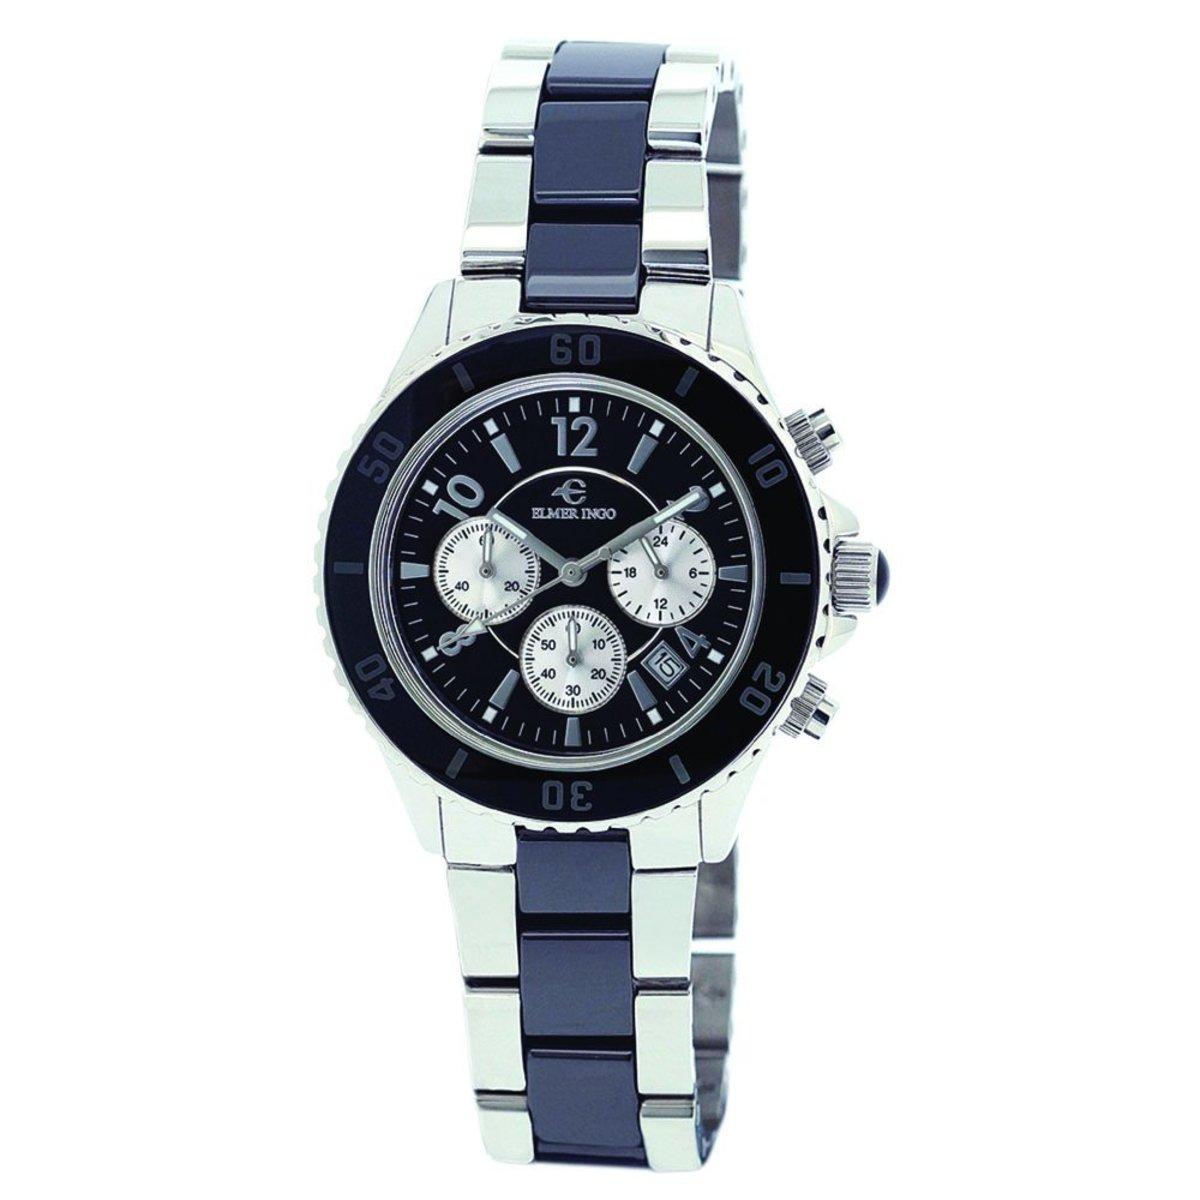 Semi Ceramics Chronograph 女裝 石英手錶 黑色錶盤 陶瓷精鋼錶帶